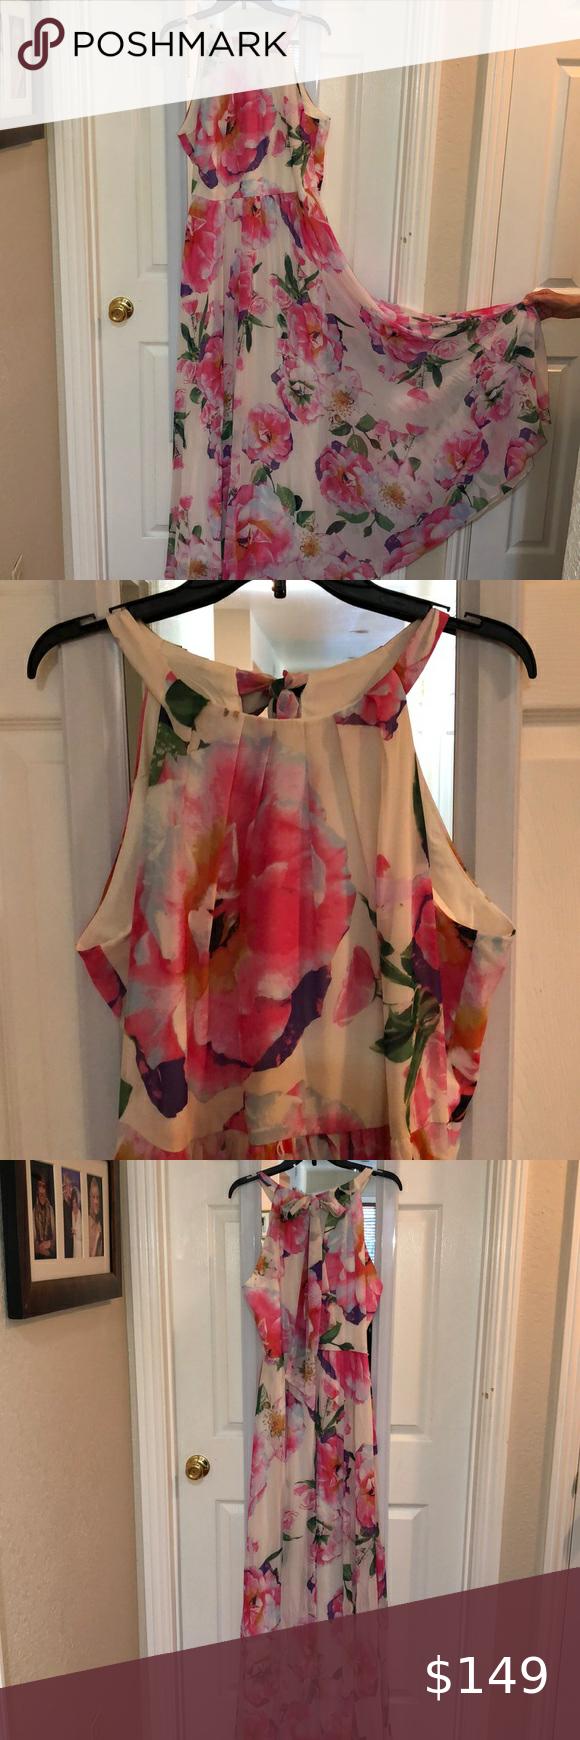 Inc Brand Flower Print Maxi Dress For Prom Wedding Beautiful Flower Dress Flowy Maxi Dress Size 16 Great Printed Maxi Dress Maxi Dress Size 16 Flower Dresses [ 1740 x 580 Pixel ]